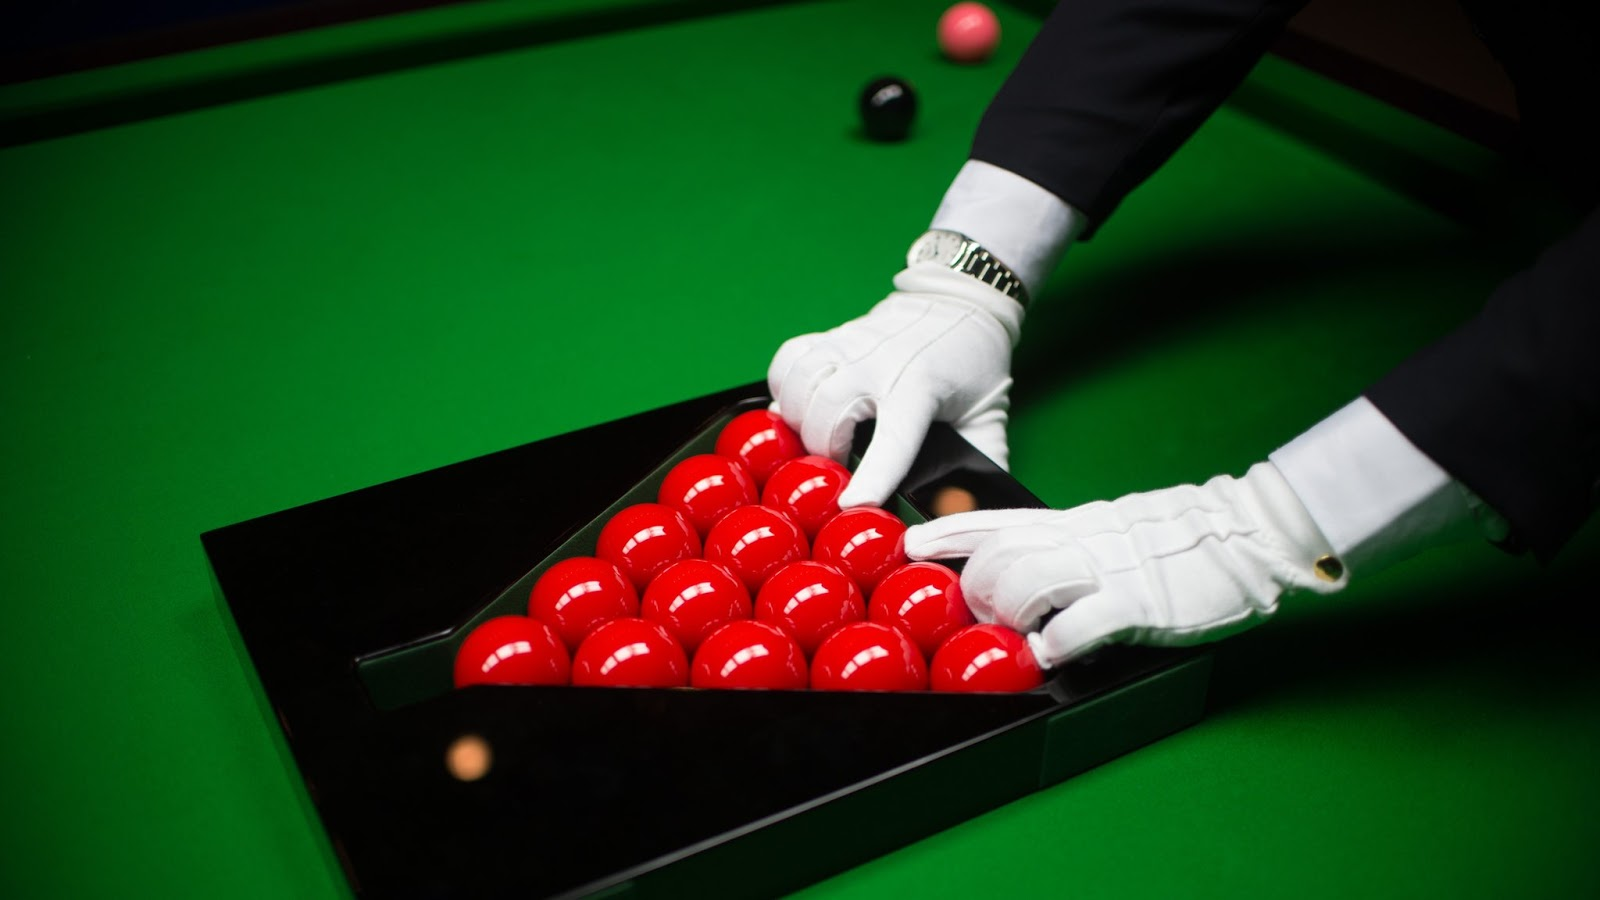 Championship world amateur snooker